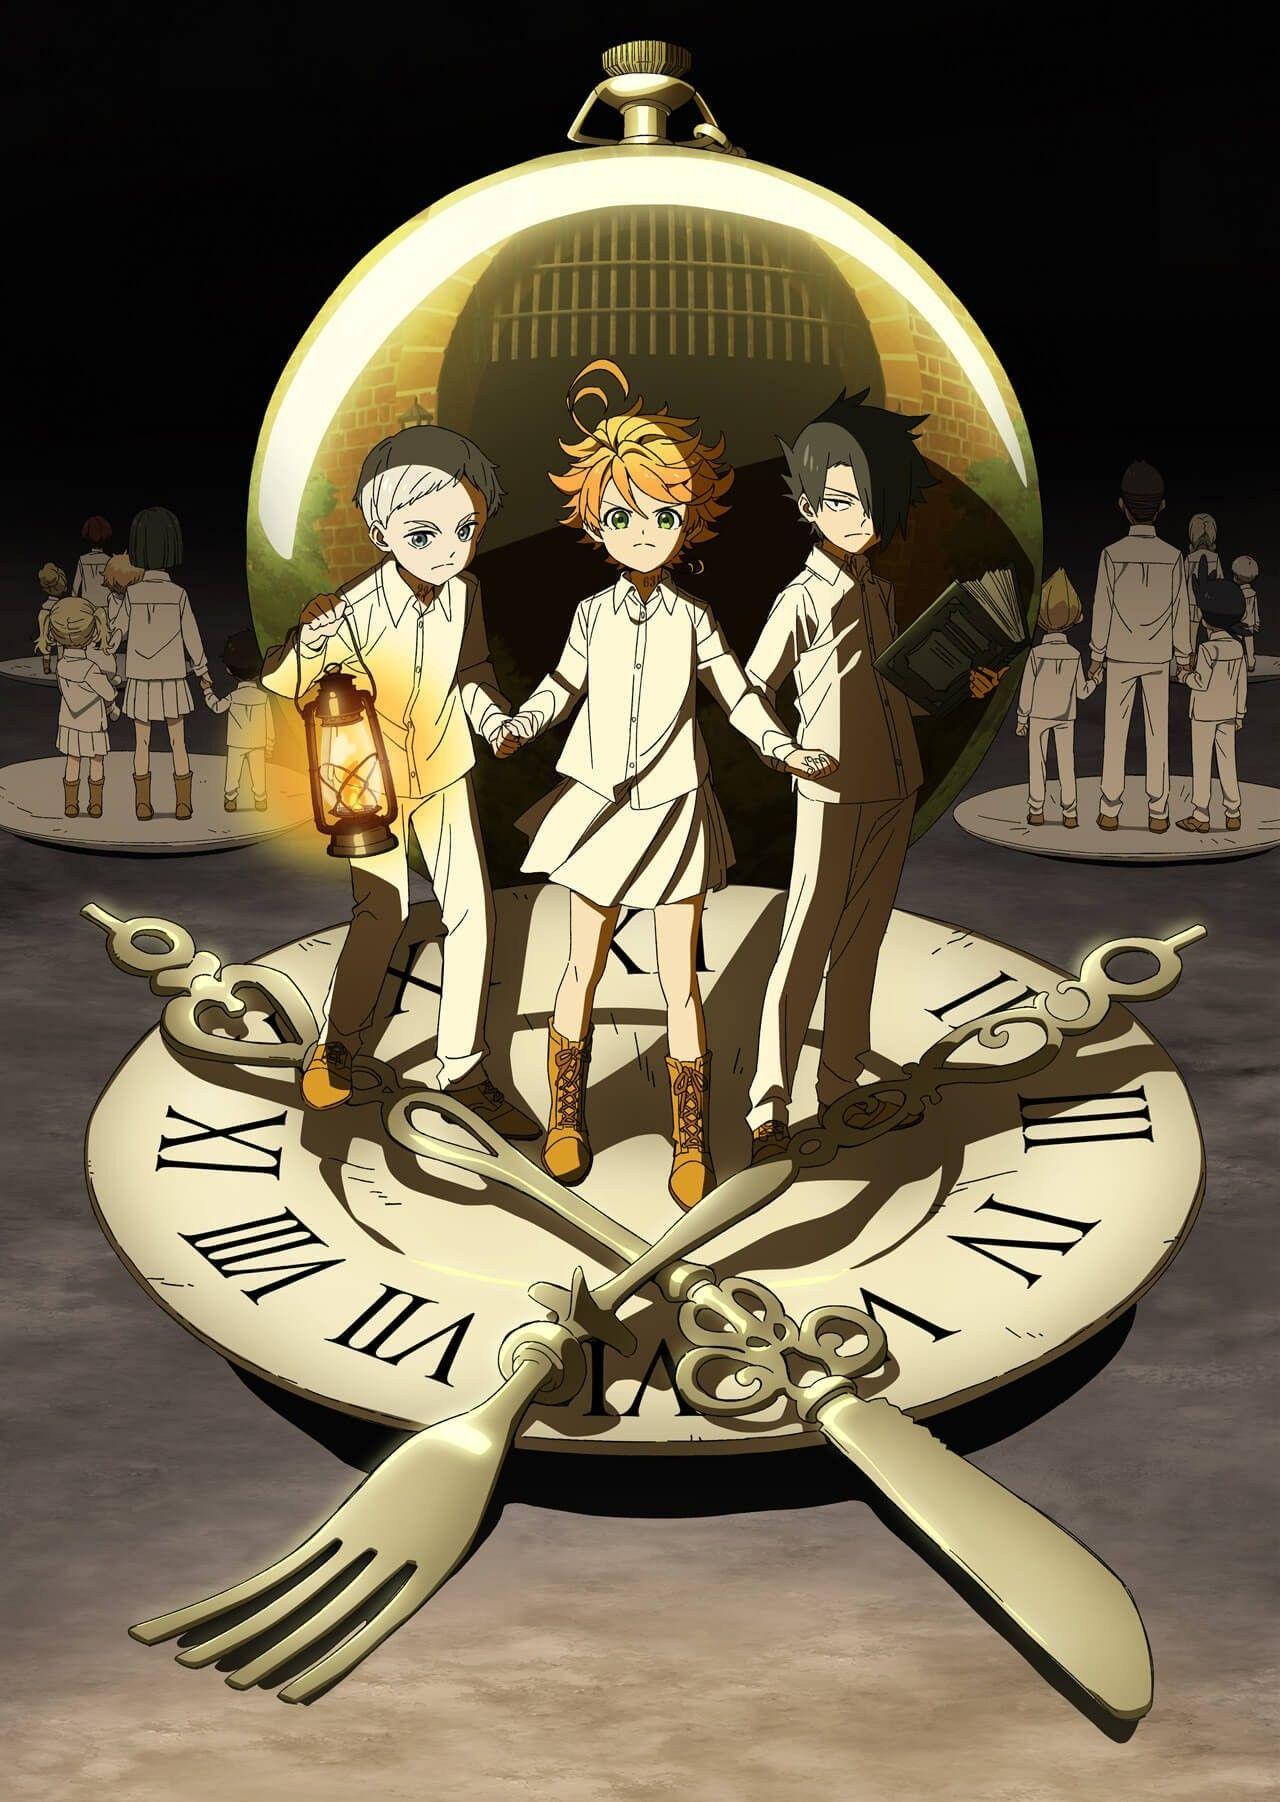 Pin de Yuu em Yakusoku no Neverland imagens) Anime